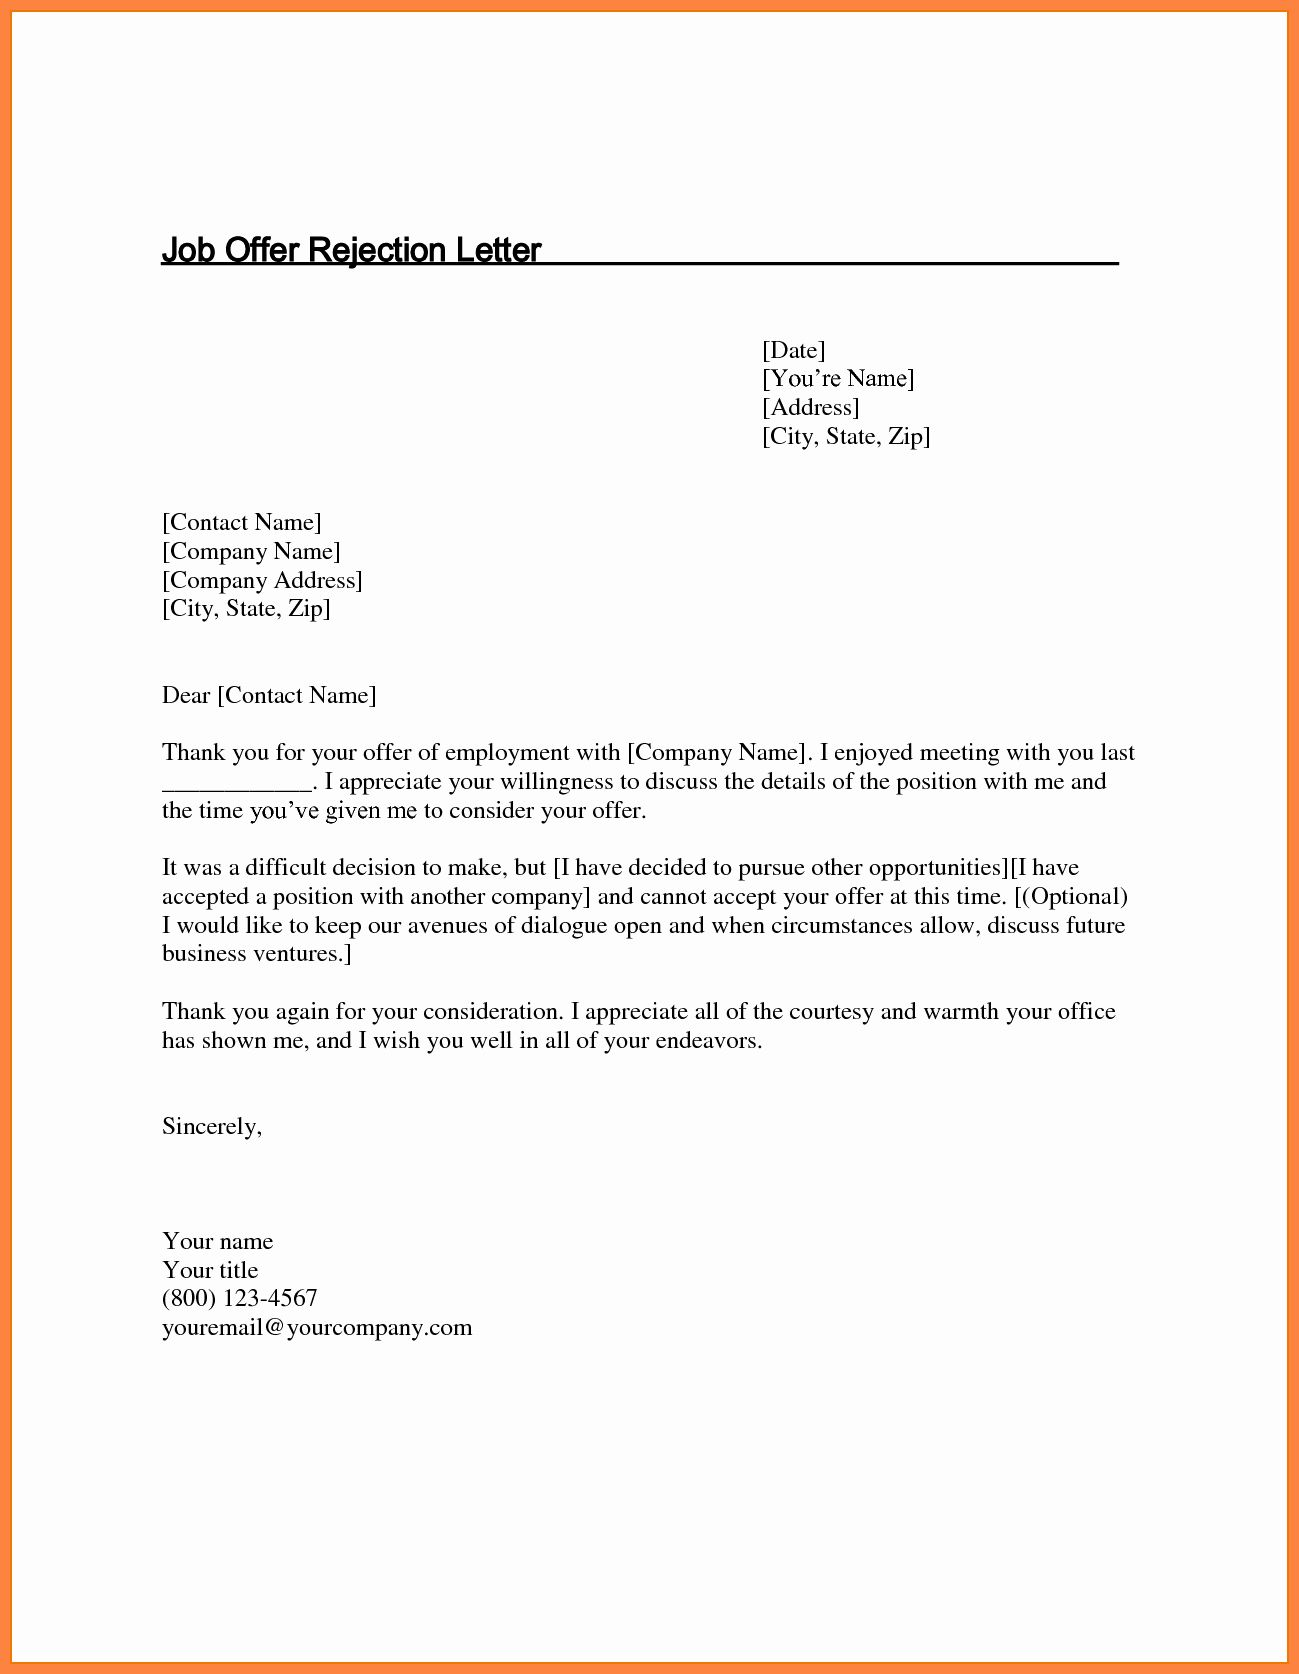 Sample Job Offer Rejection Letter from i.pinimg.com